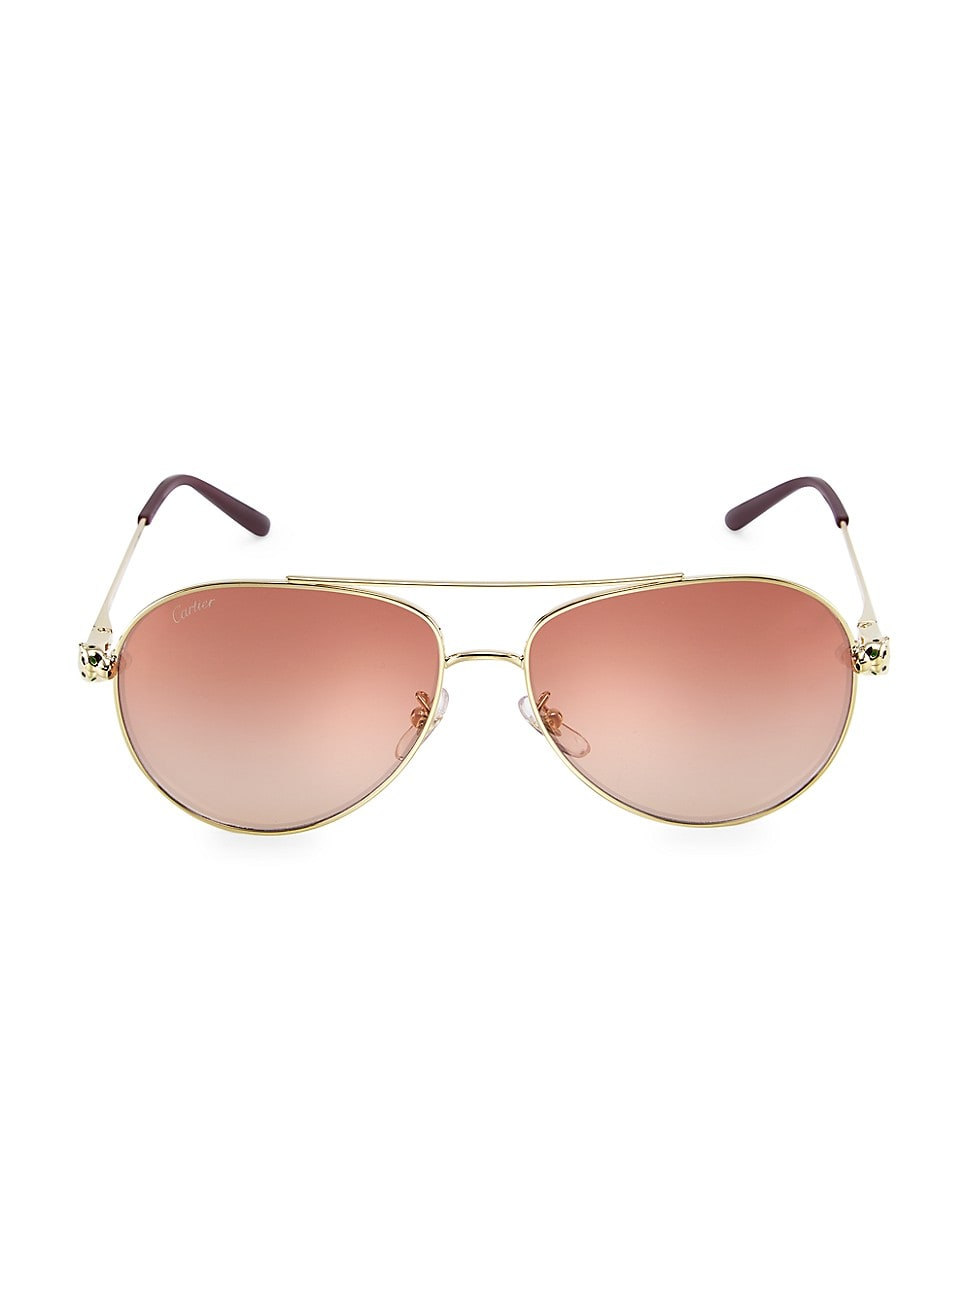 Cartier Women's 61mm Aviator Sunglasses In Gold